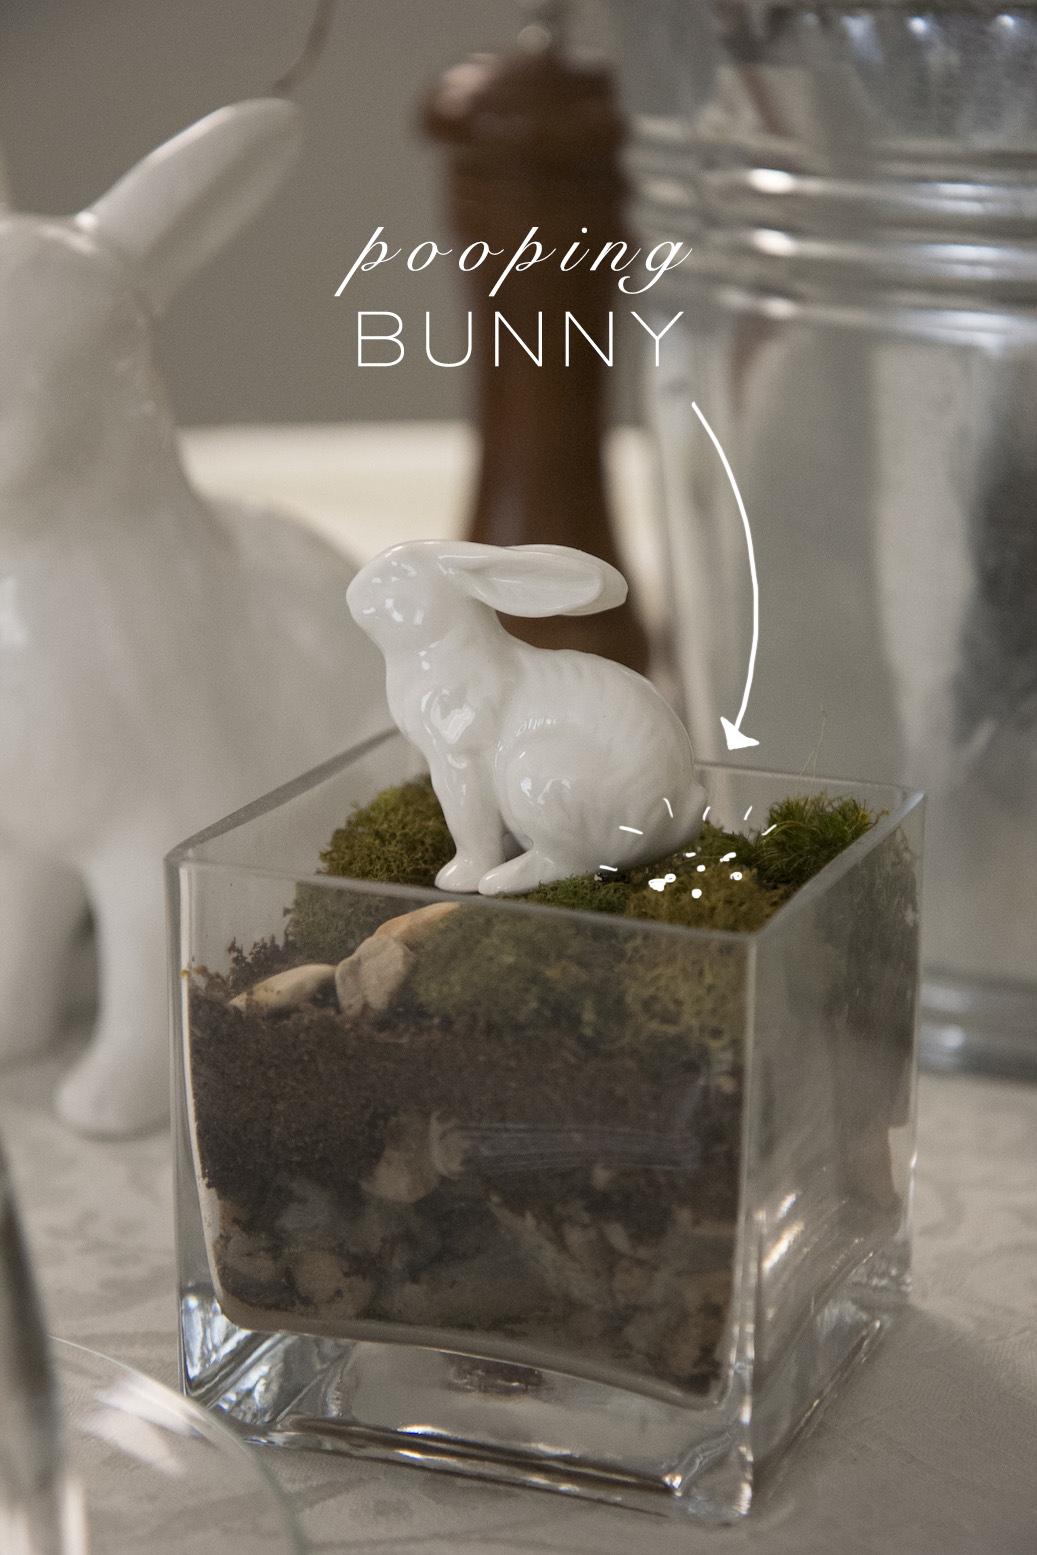 Pooping bunny